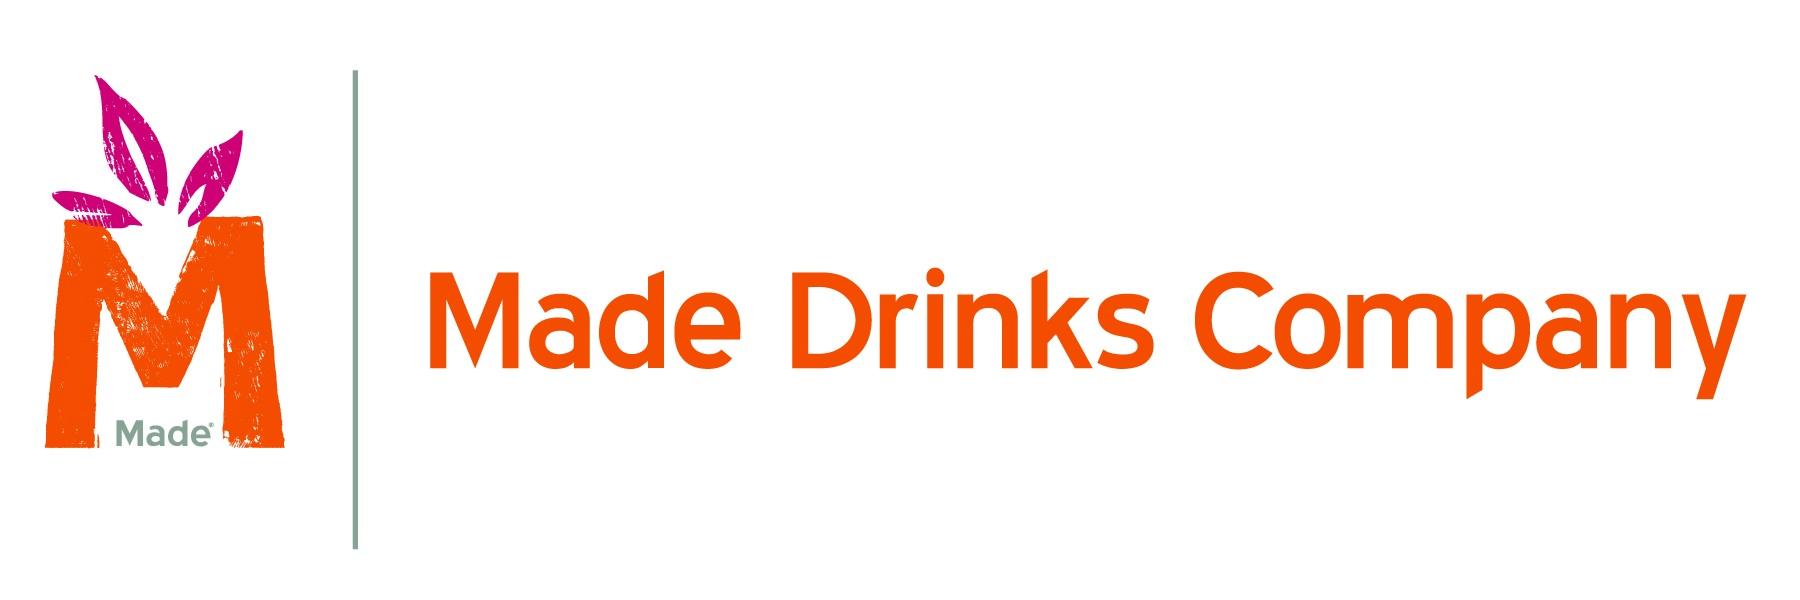 MADE Drinks Company